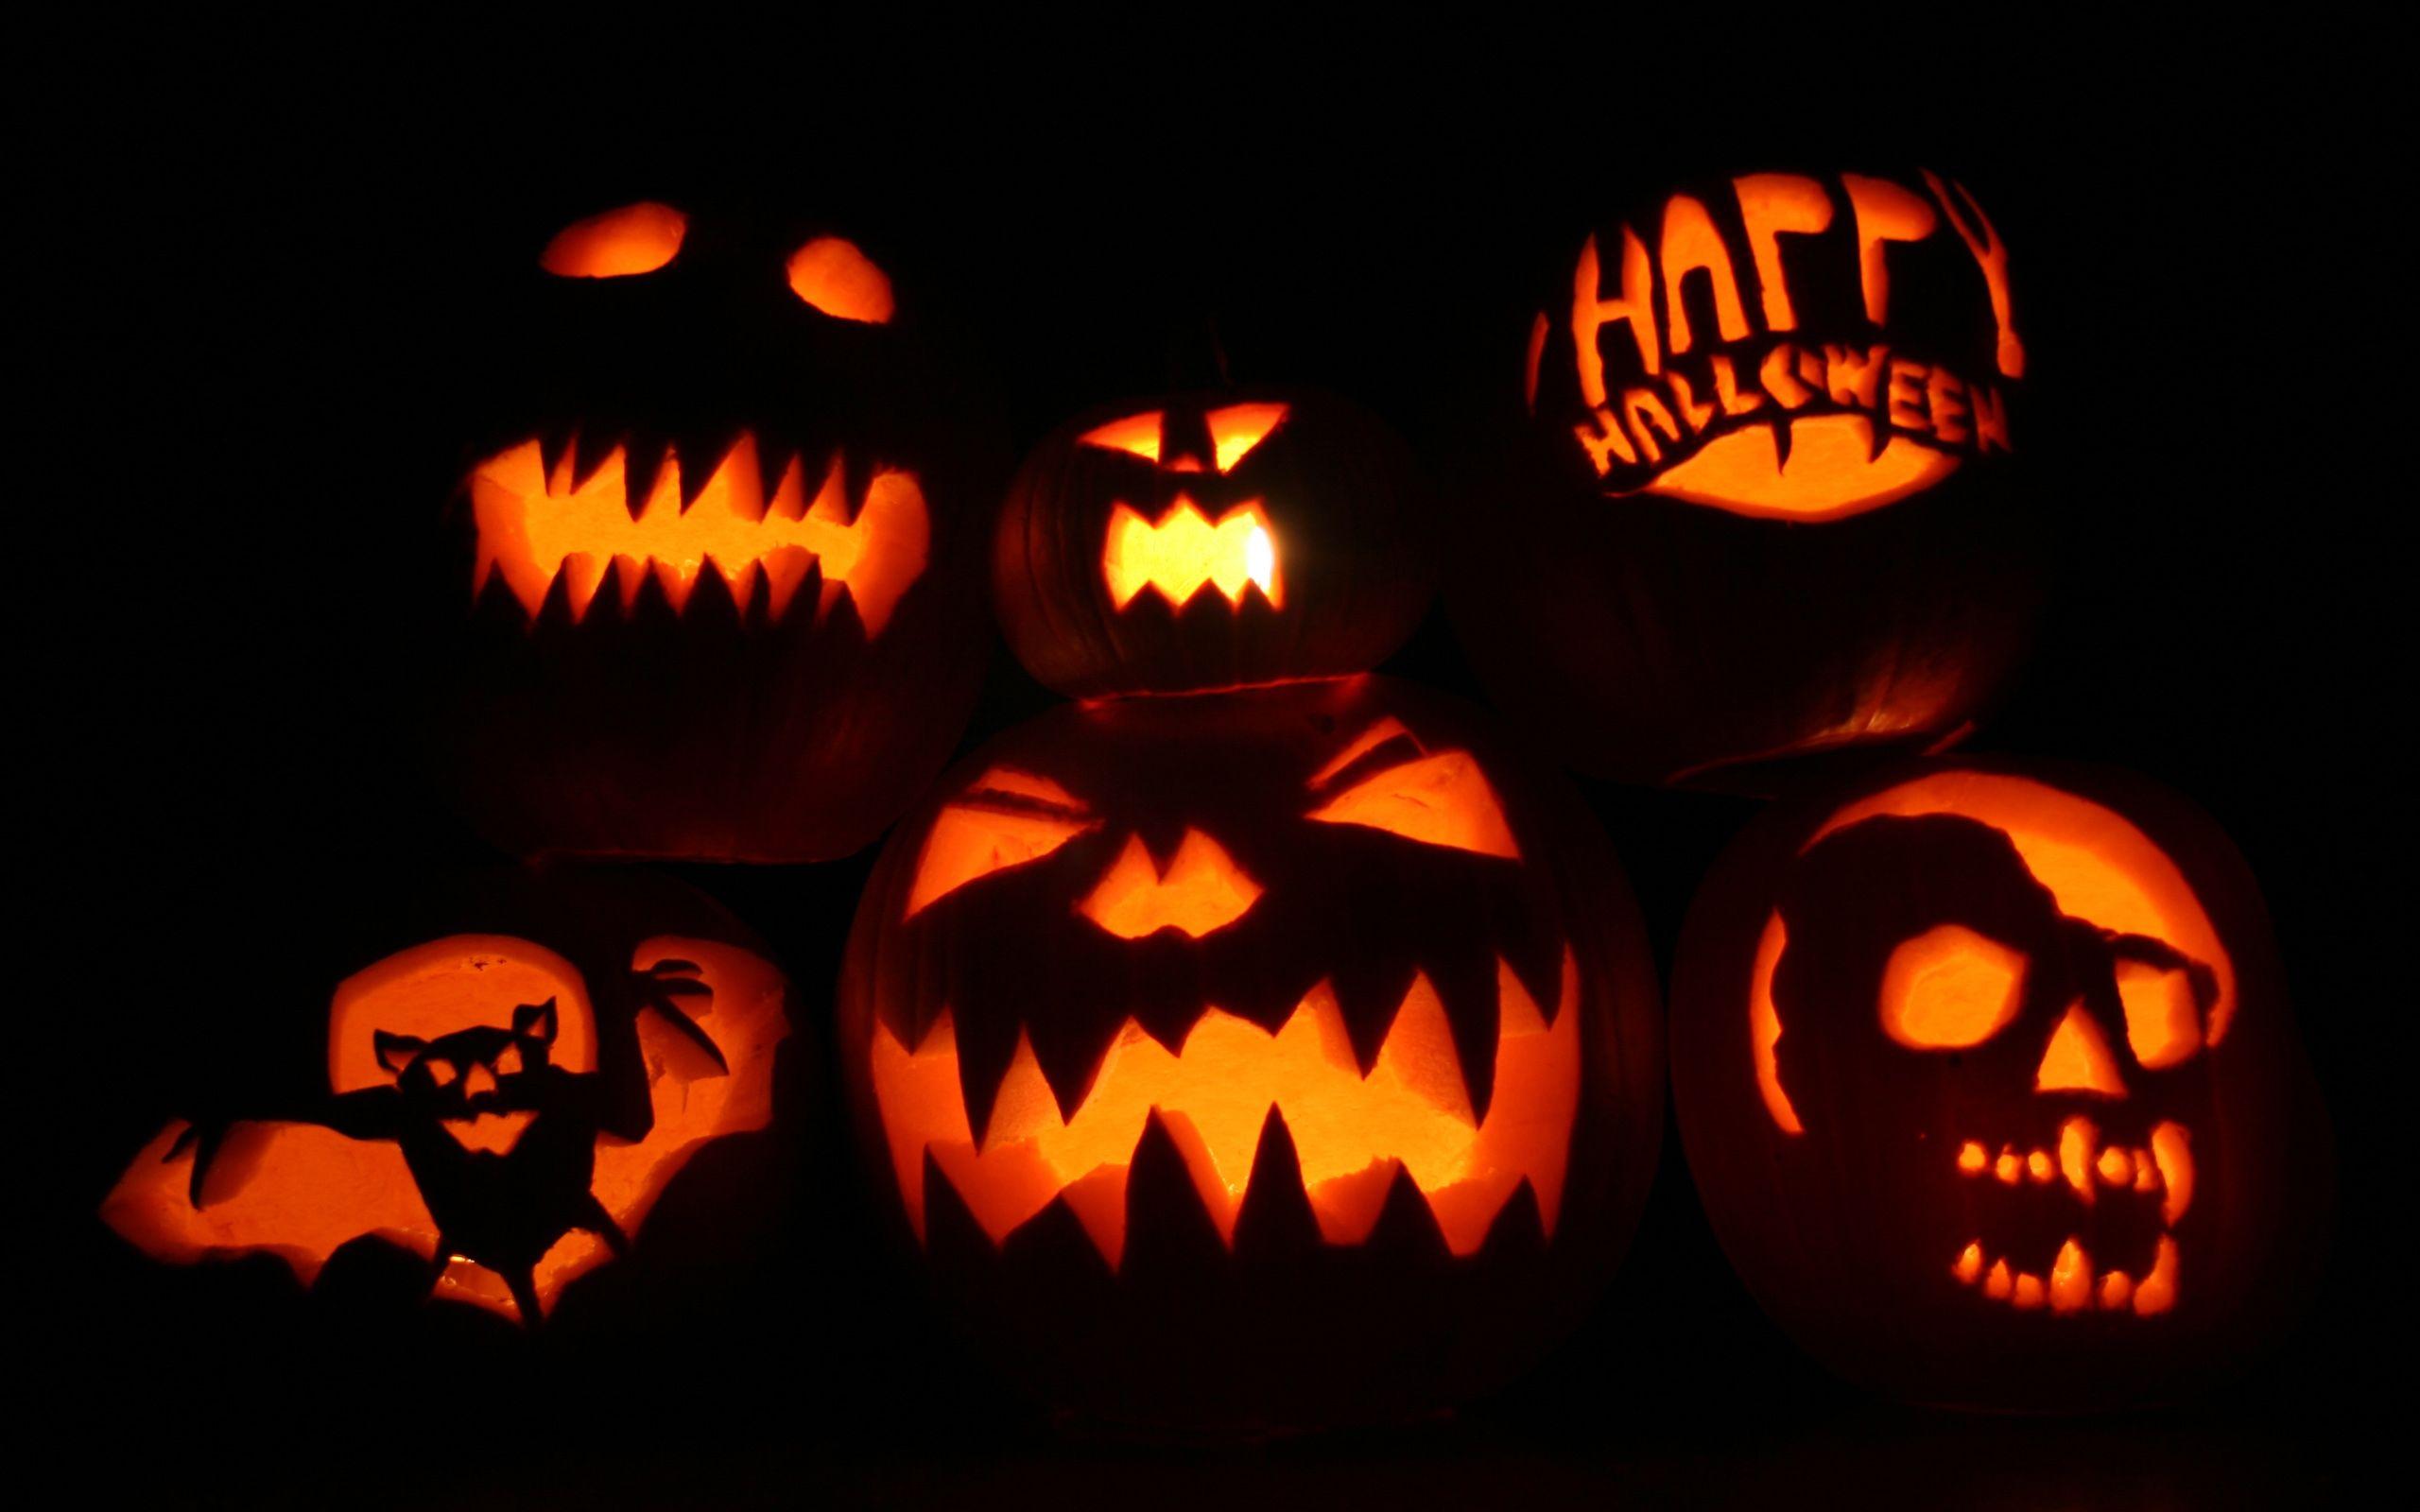 Simple Wallpaper Halloween Facebook - 2a325af3d08b75d3edb0eae965a135c9  Image_47388.jpg